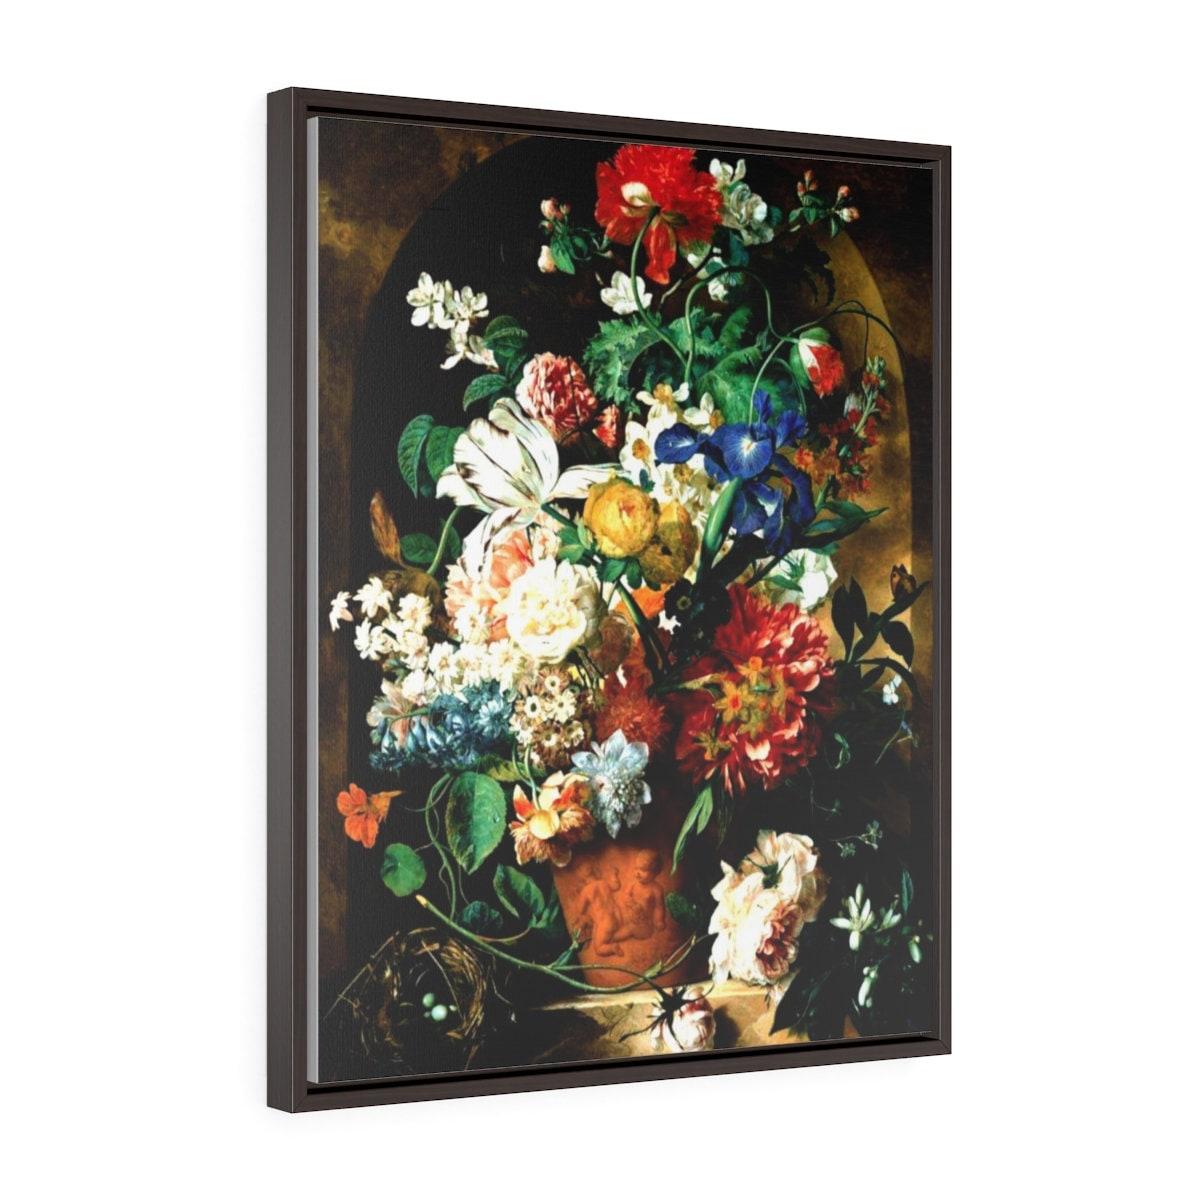 Floral Art Framed Wrap Canvas Flower Painting Print Dark Etsy